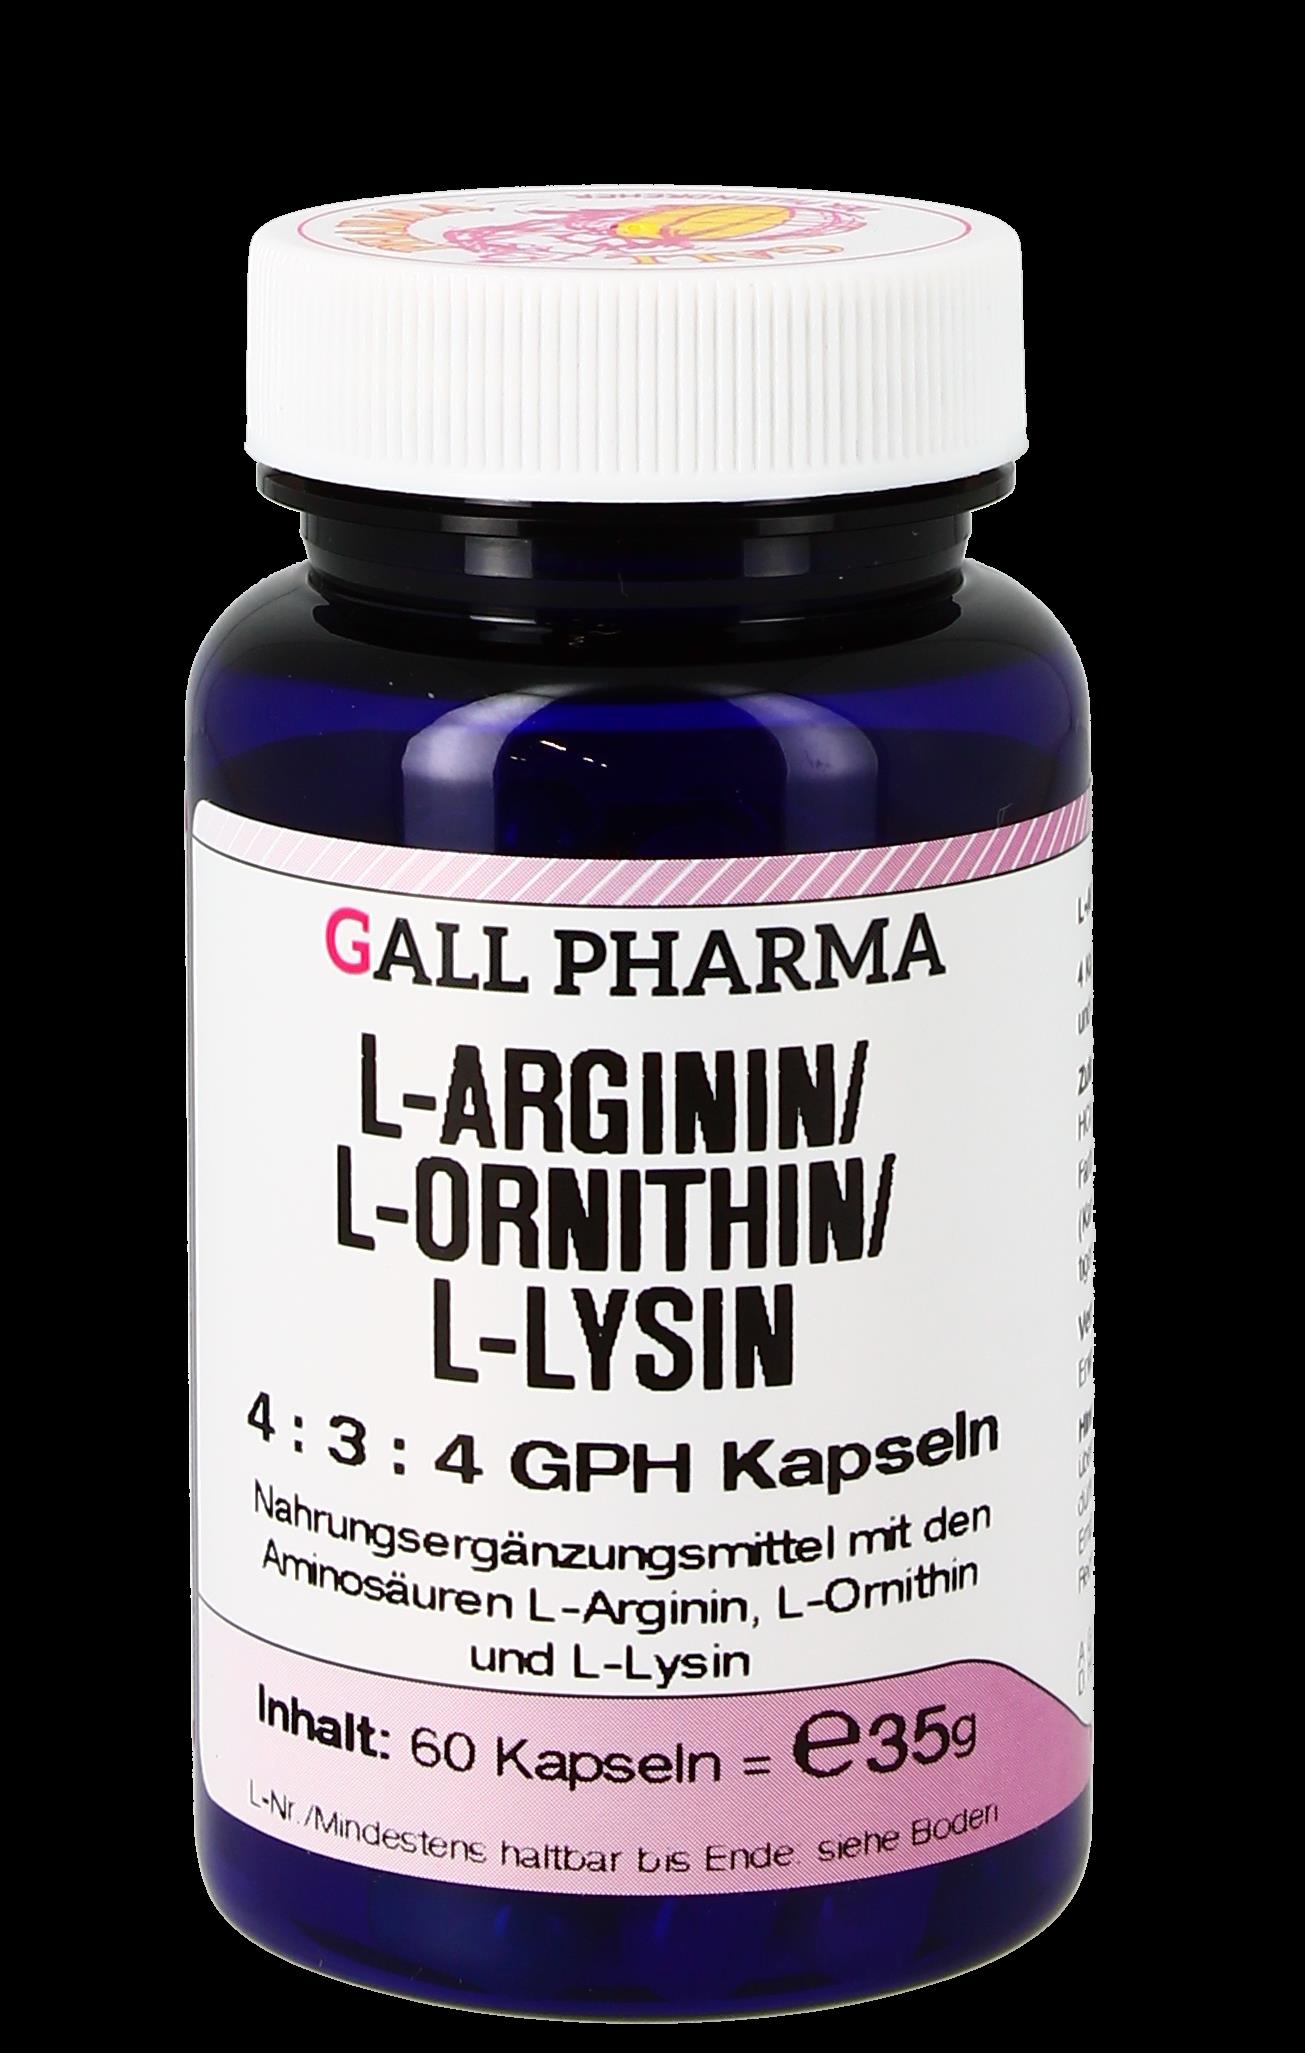 L-Arginin/L-Ornithin/L-Lysin 4:3:4 GPH Kapseln